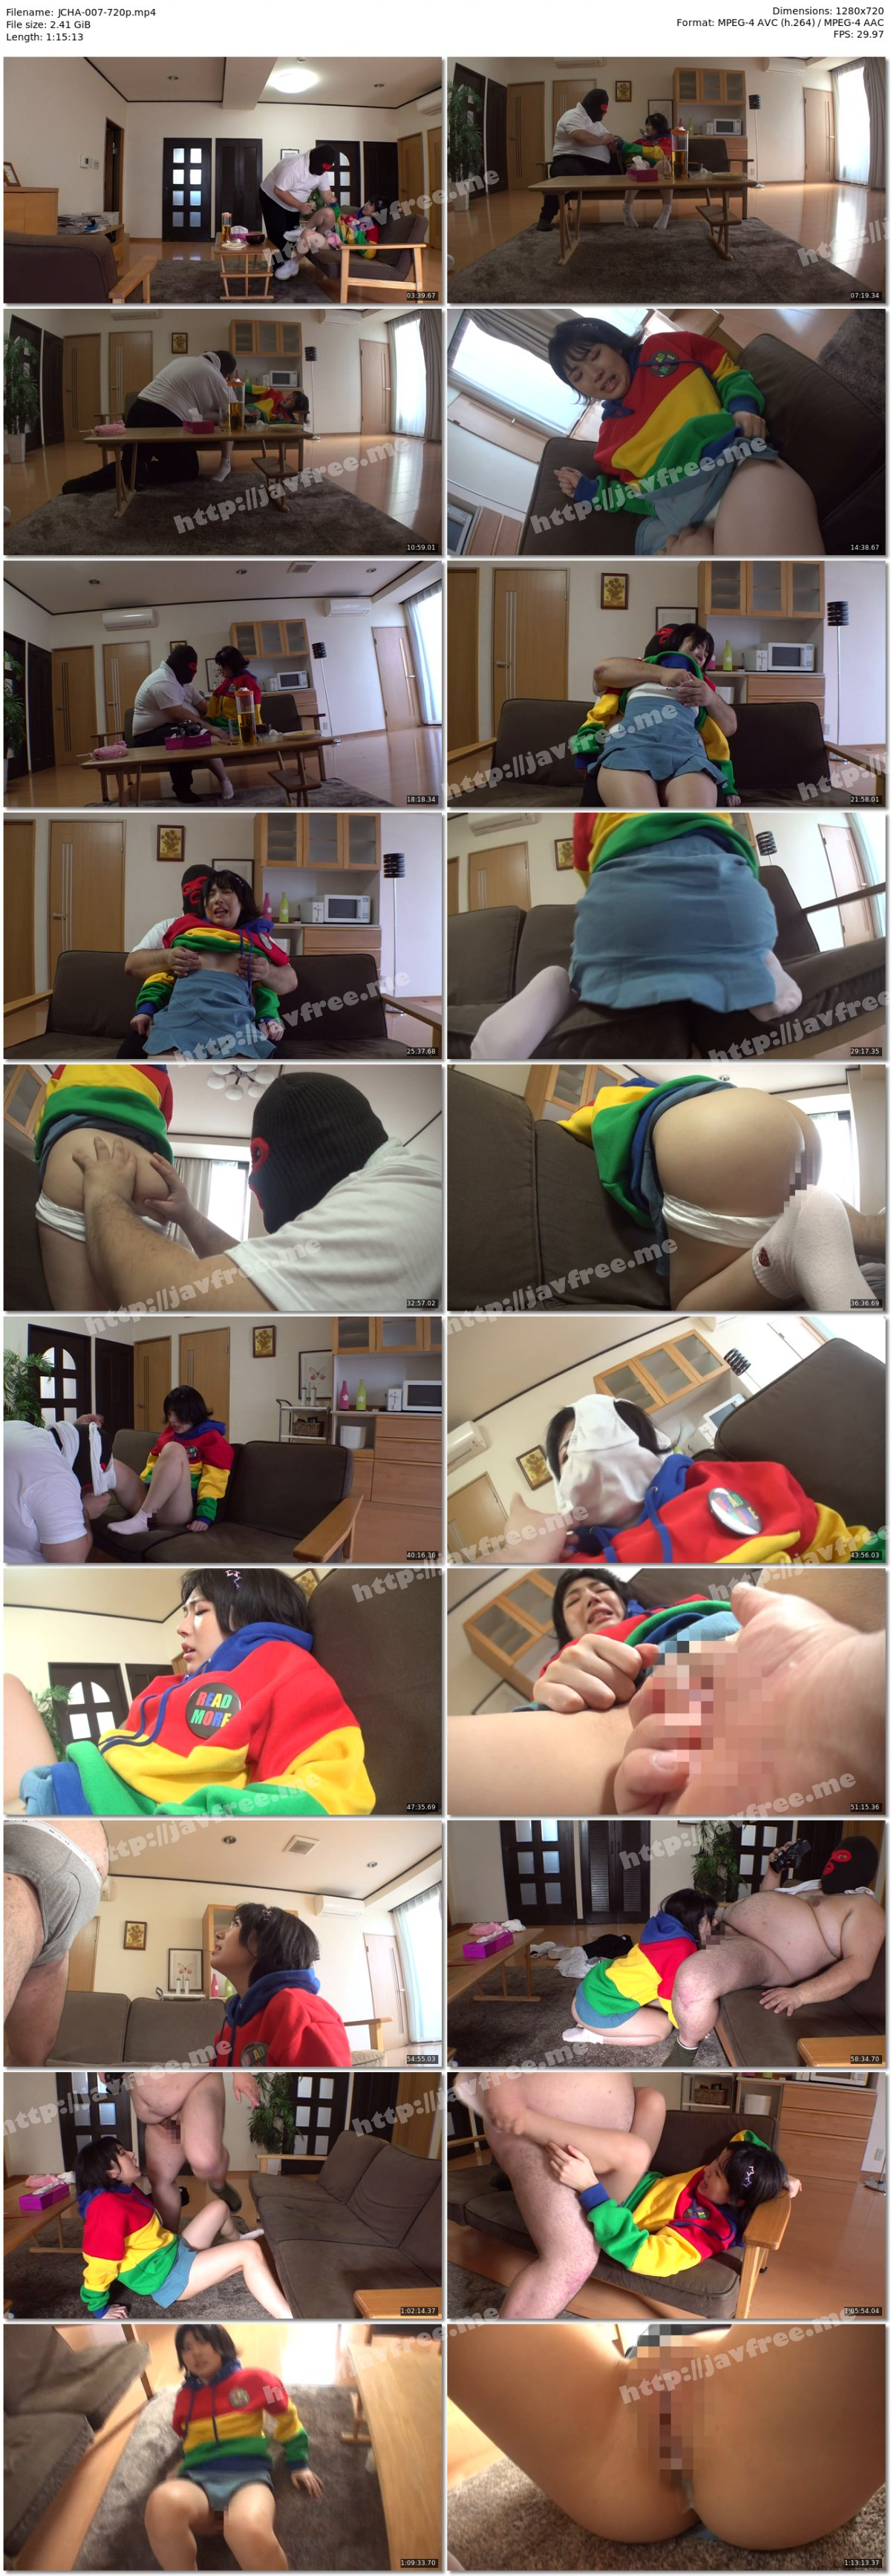 [HD][NHDTB-522] 敏感薬エステ襲激2 異常に感じやすくなったマ○コを無数の手で責められ拒みながらも絶頂が止まらない女 - image JCHA-007-720p on https://javfree.me